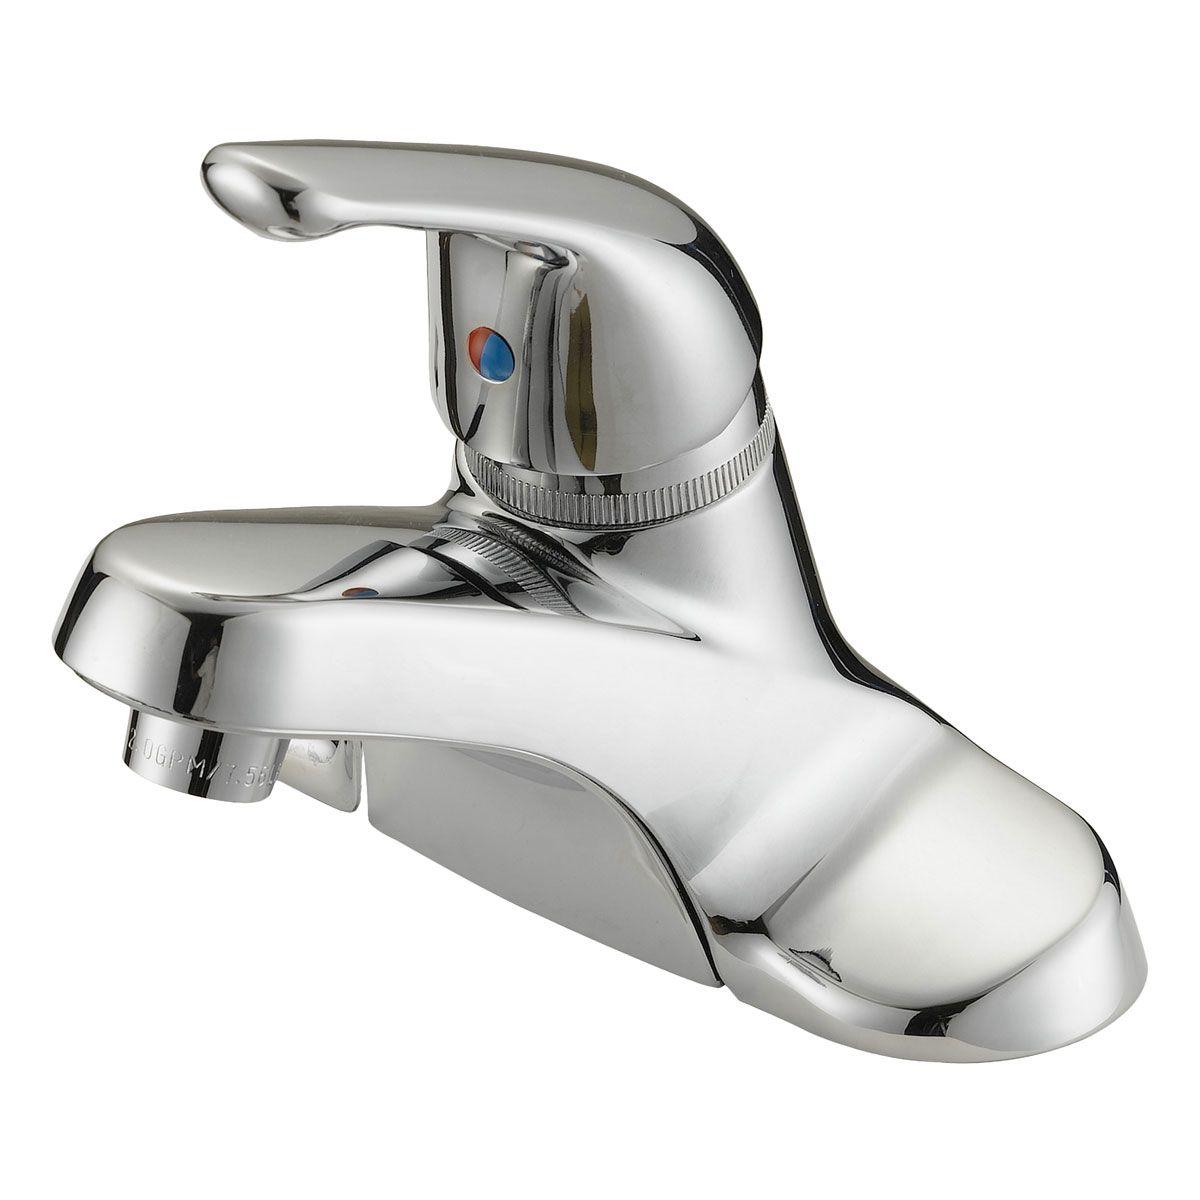 Bar/Bathroom Faucet LB2C, Chrome Finish (4 In Spread) | Faucet